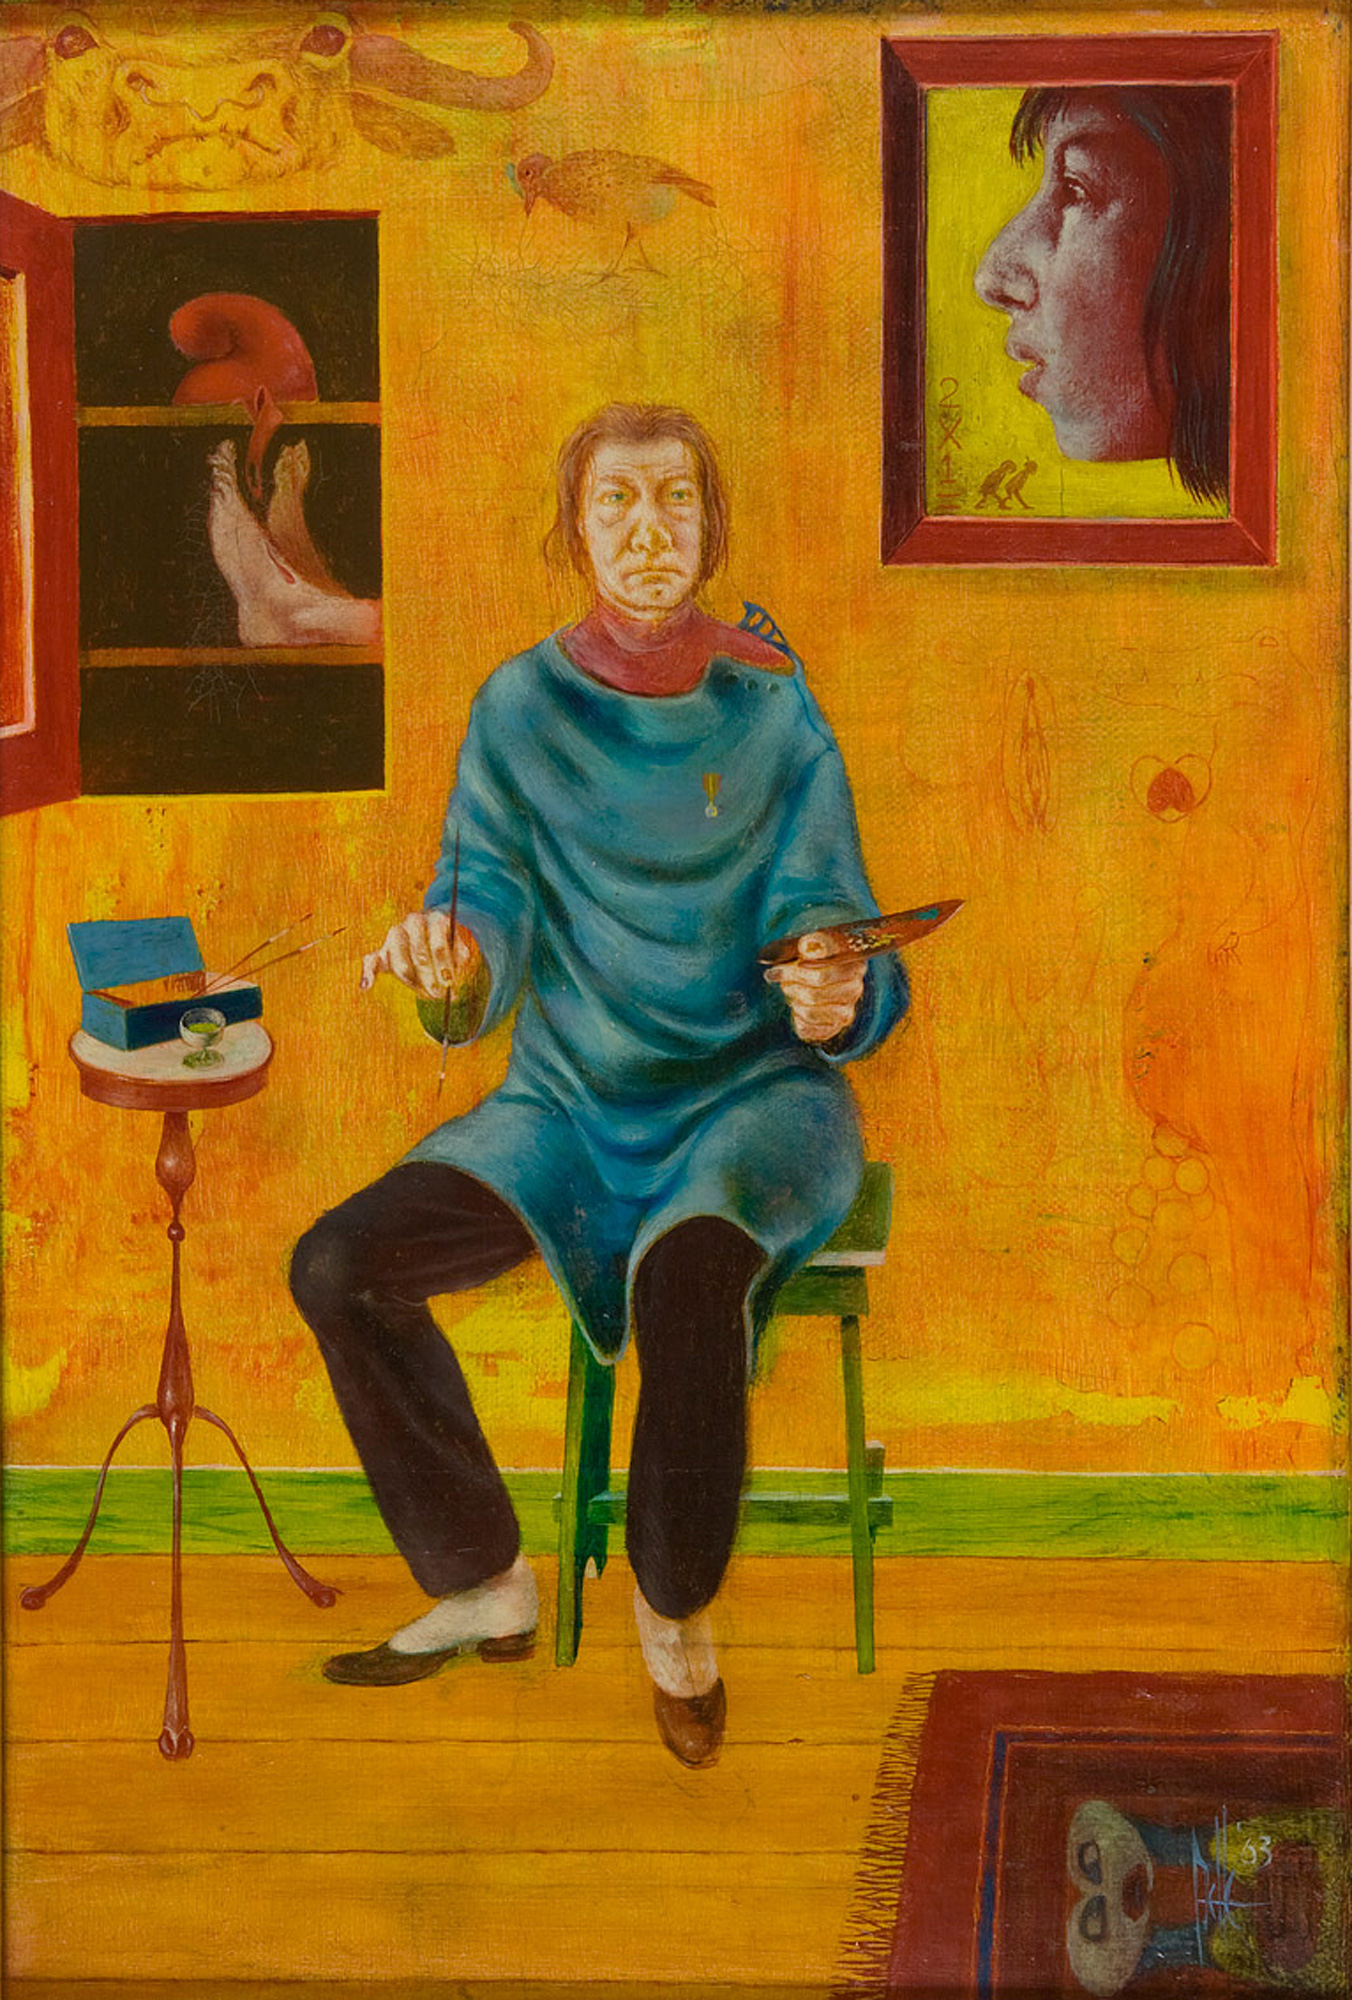 Melle schilder | Meisje met Wijnvlek (zelfportret), olieverf op linnen